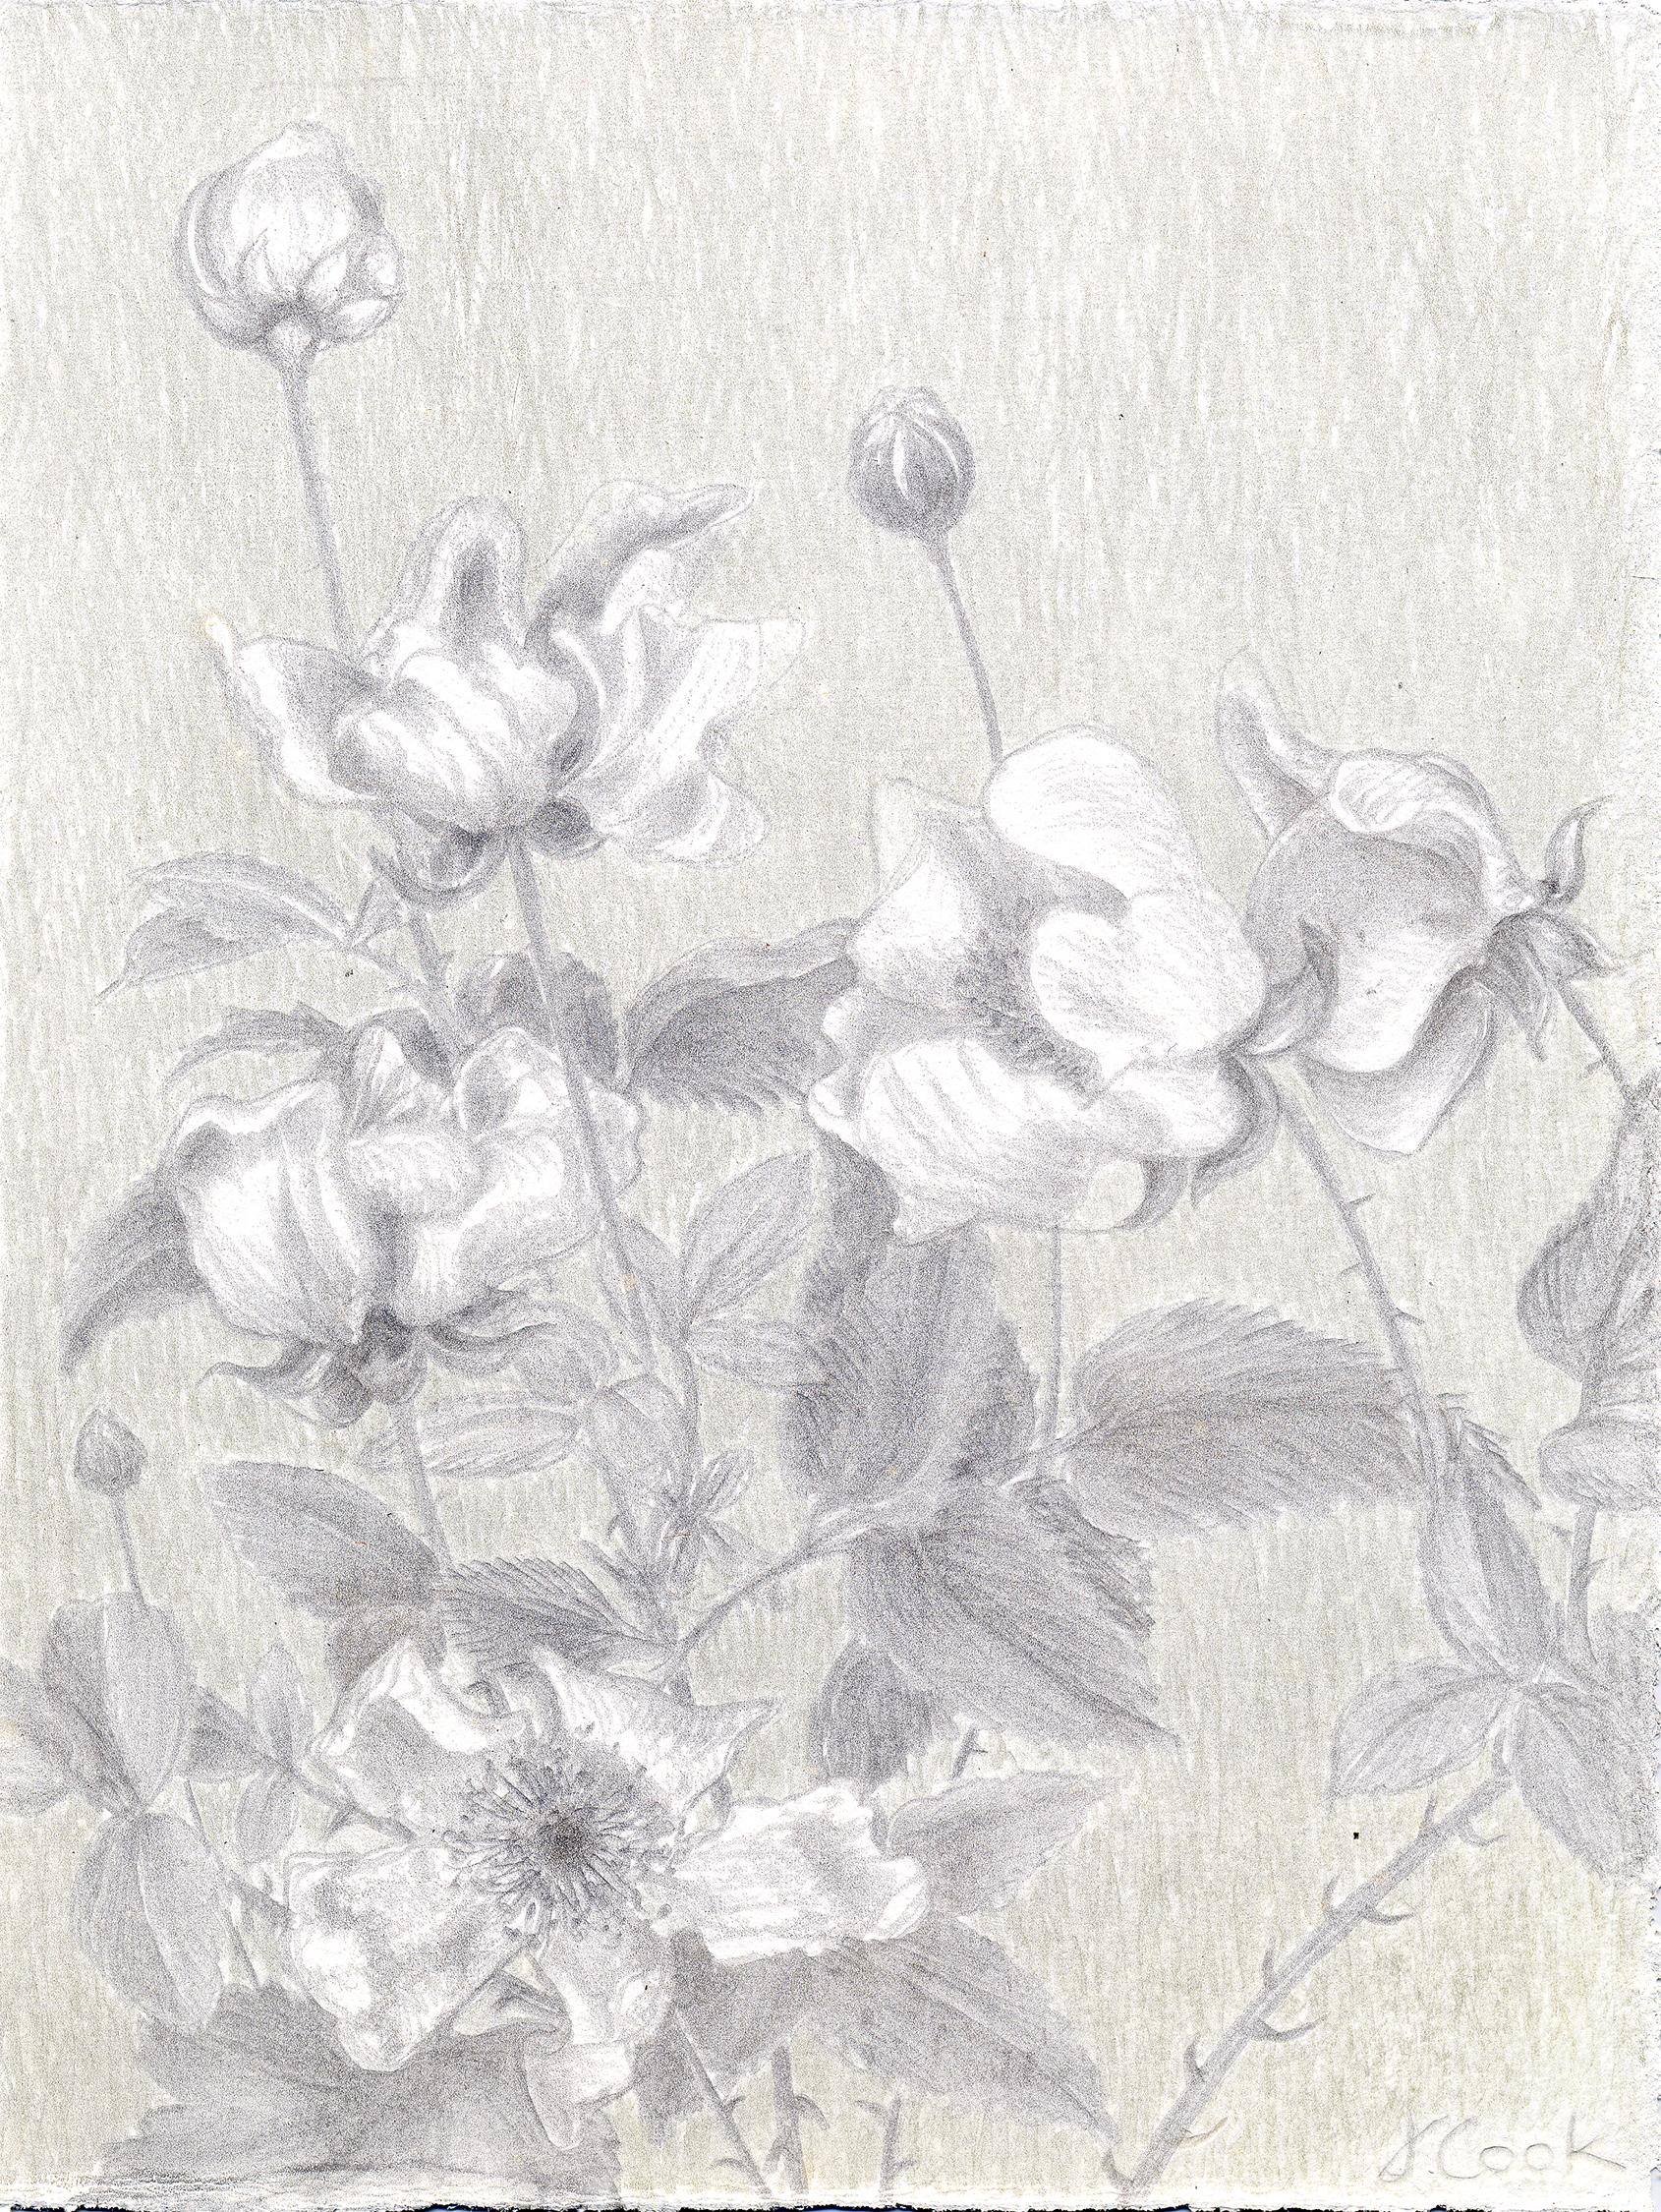 Roadside Blackberries. silverpoint/copperpoint, Jeannine Cook artist